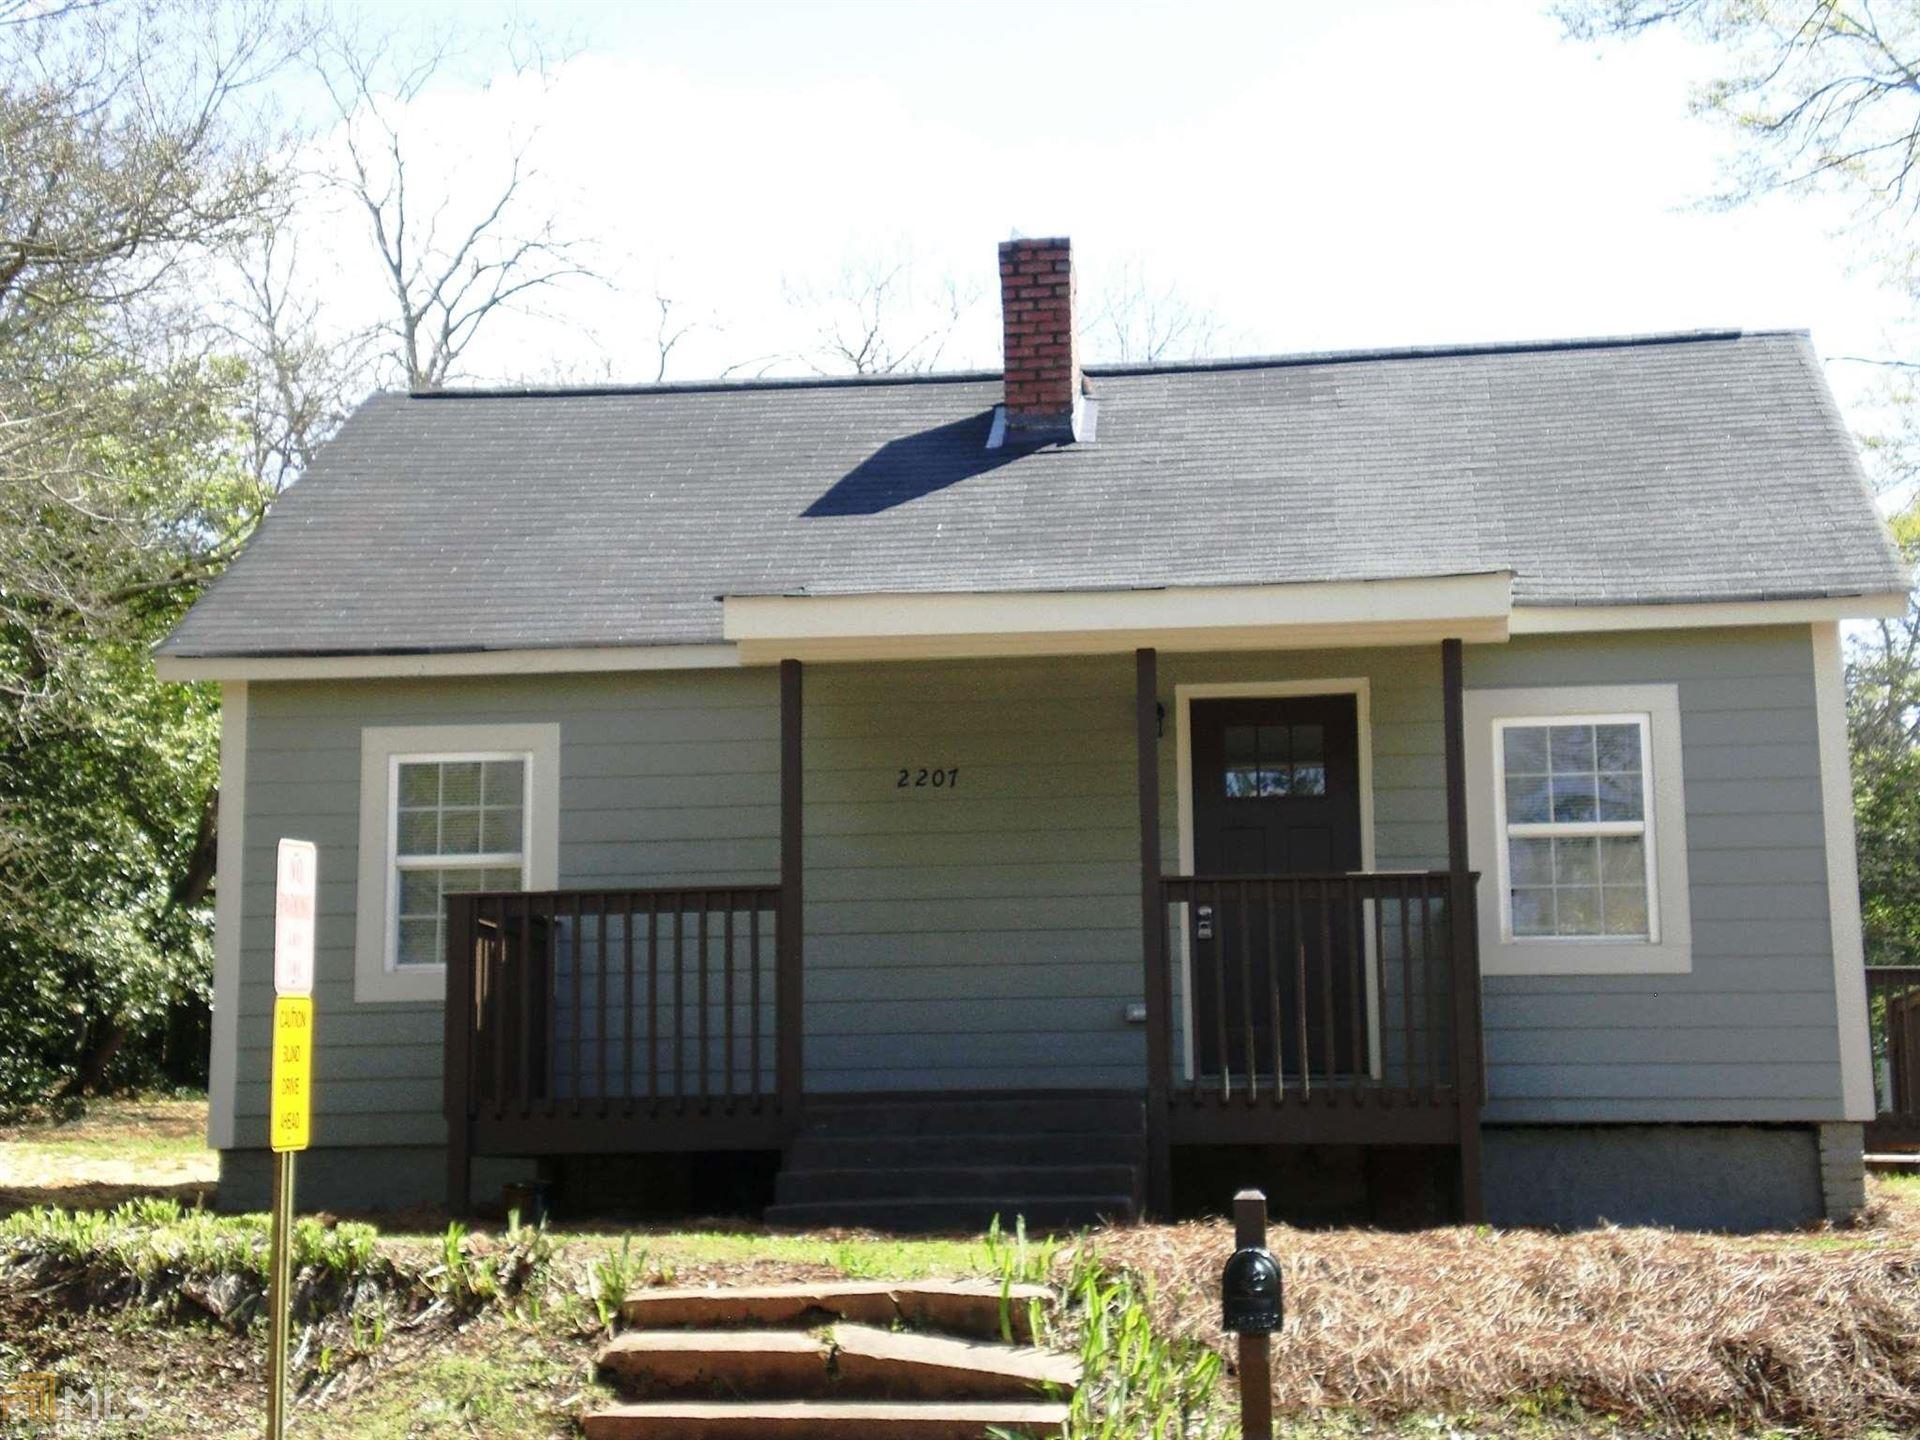 2207 Emory St, Covington, GA 30014 - #: 8811421